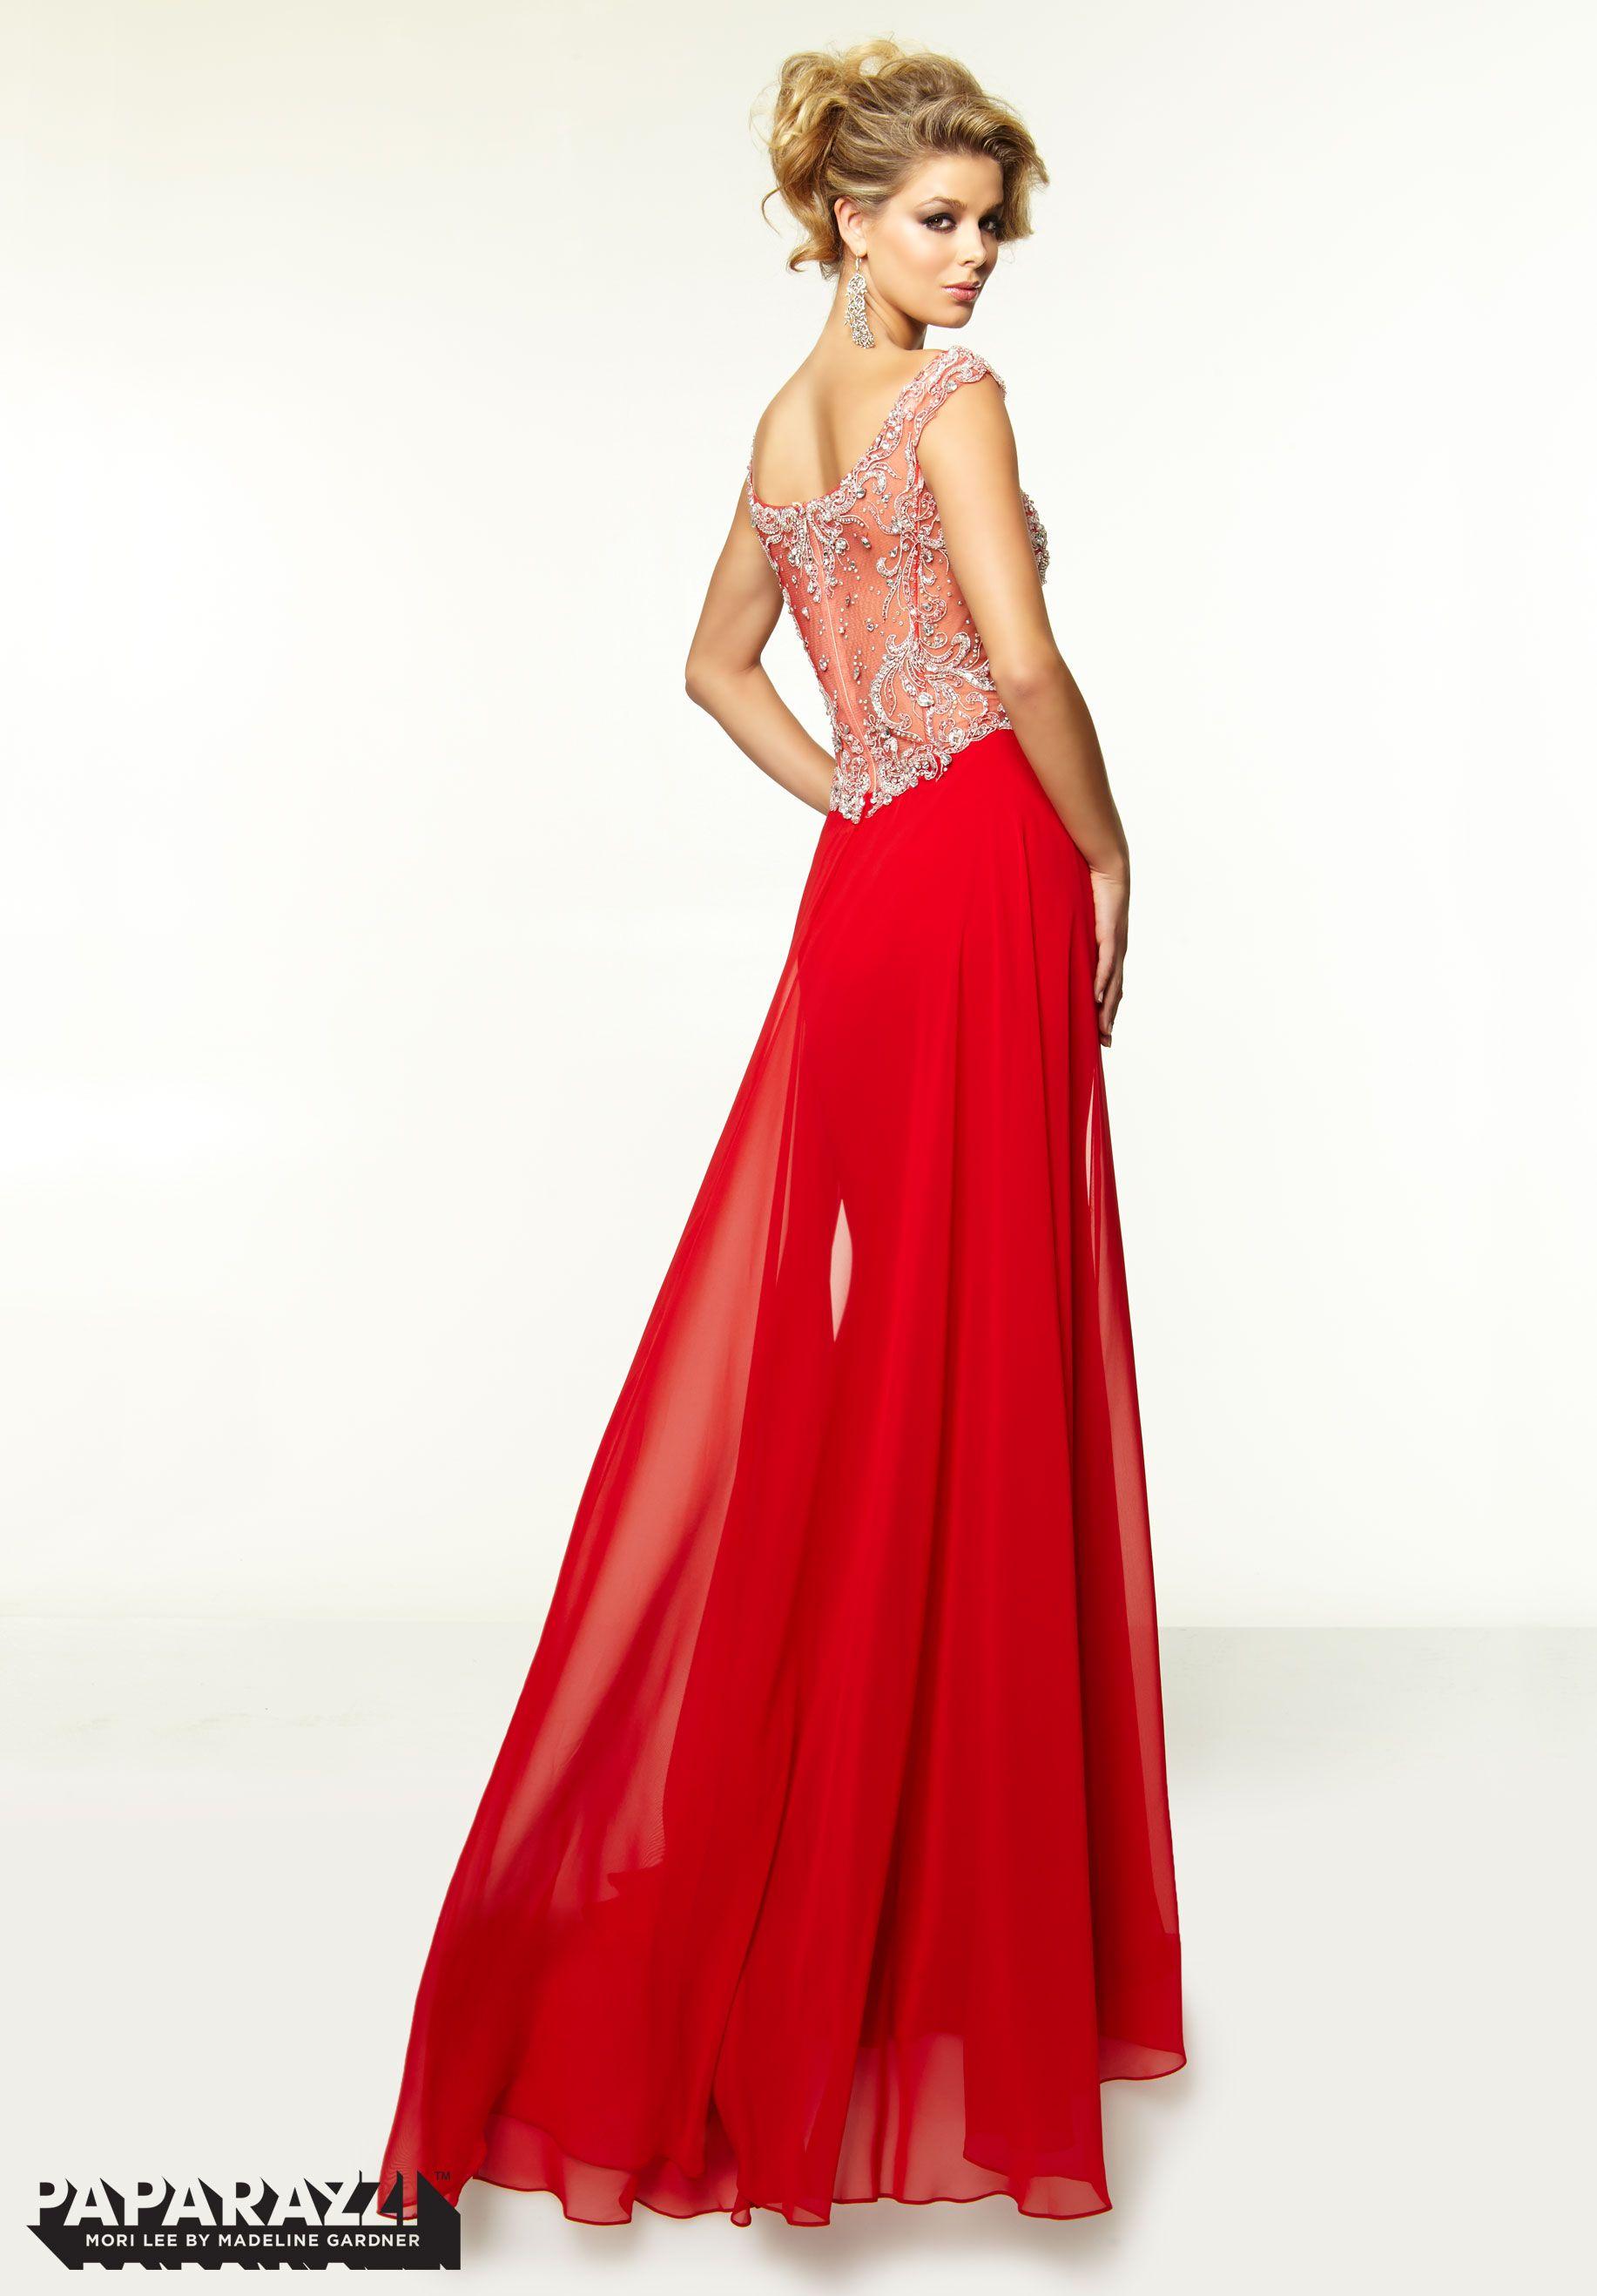 Prom Dresses by Paparazzi Prom - Dress Style 97102  146c13ef1f